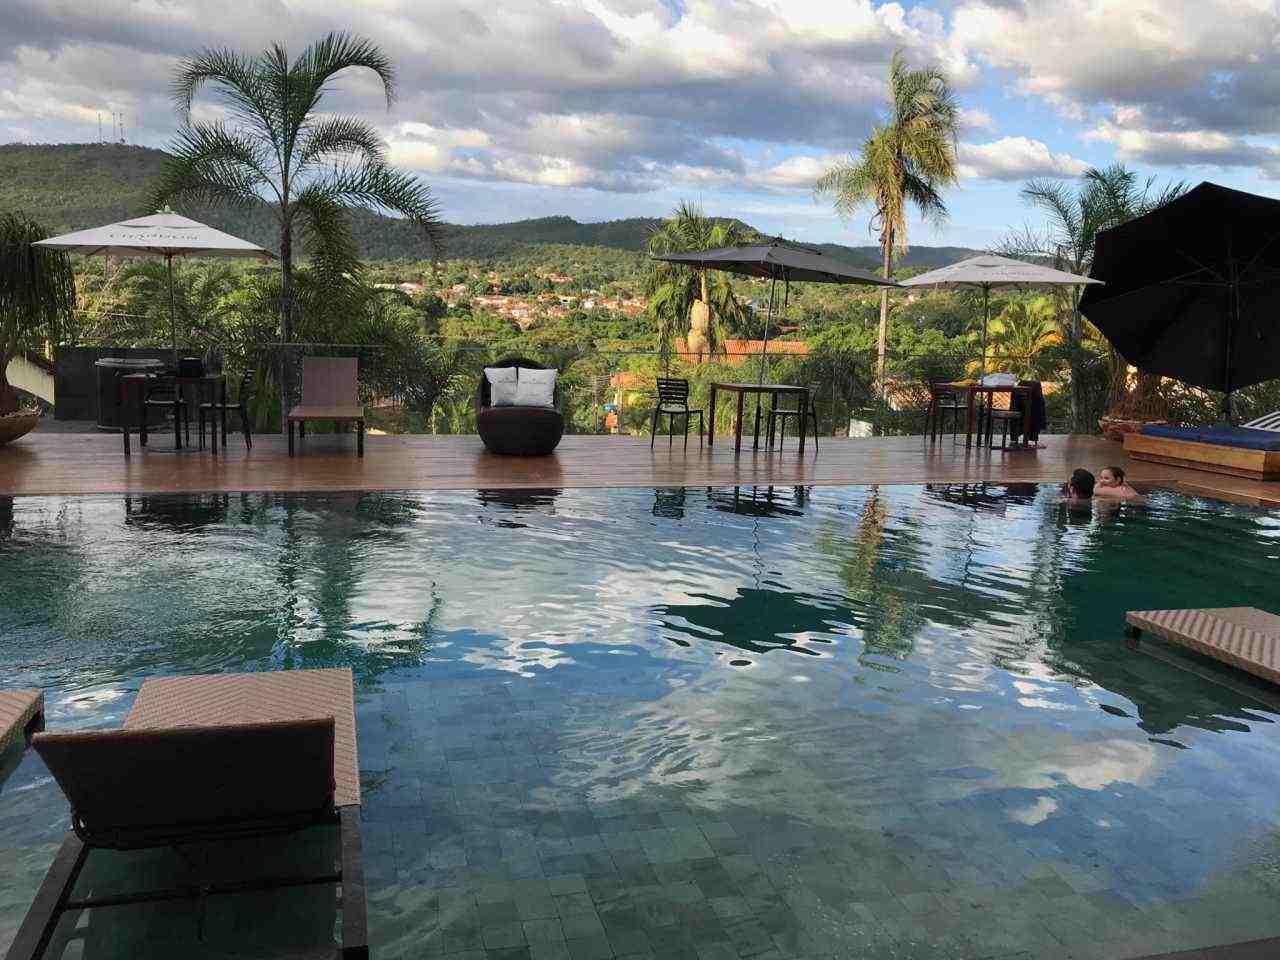 Dádiva Hotel Boutique - piscina